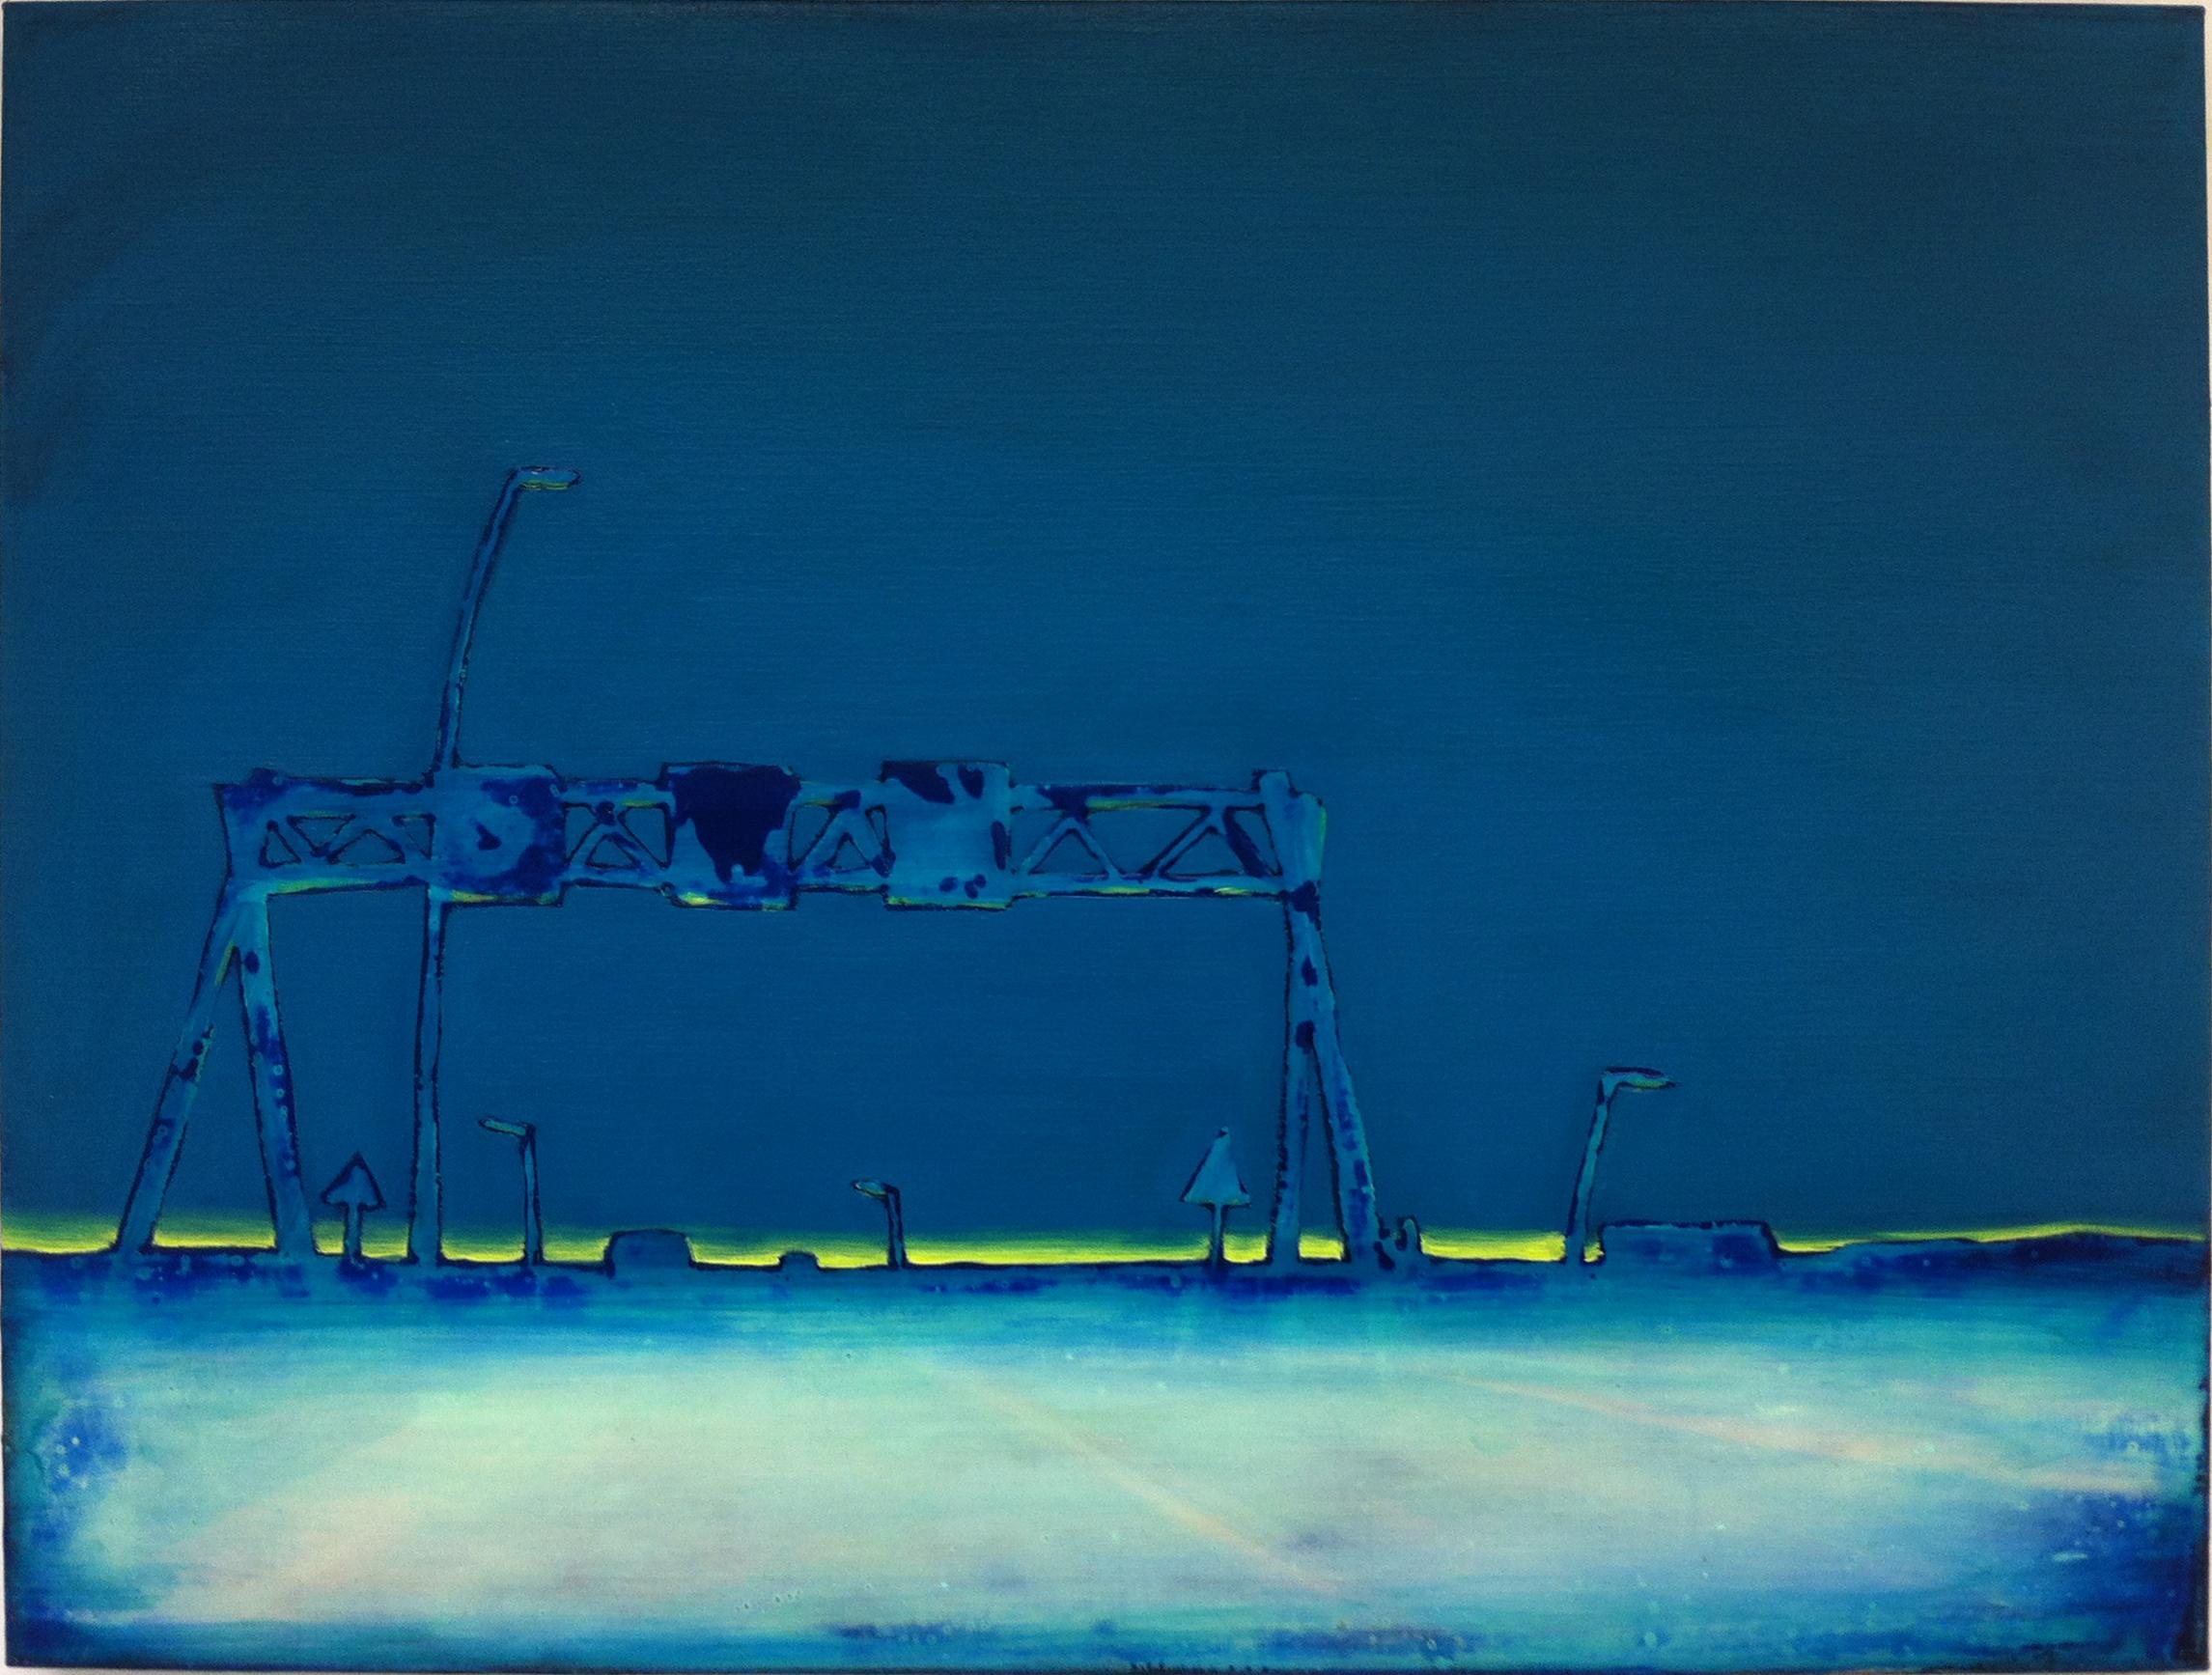 A2-NL-01  60X80 cm acrylic and epoxy on canvas